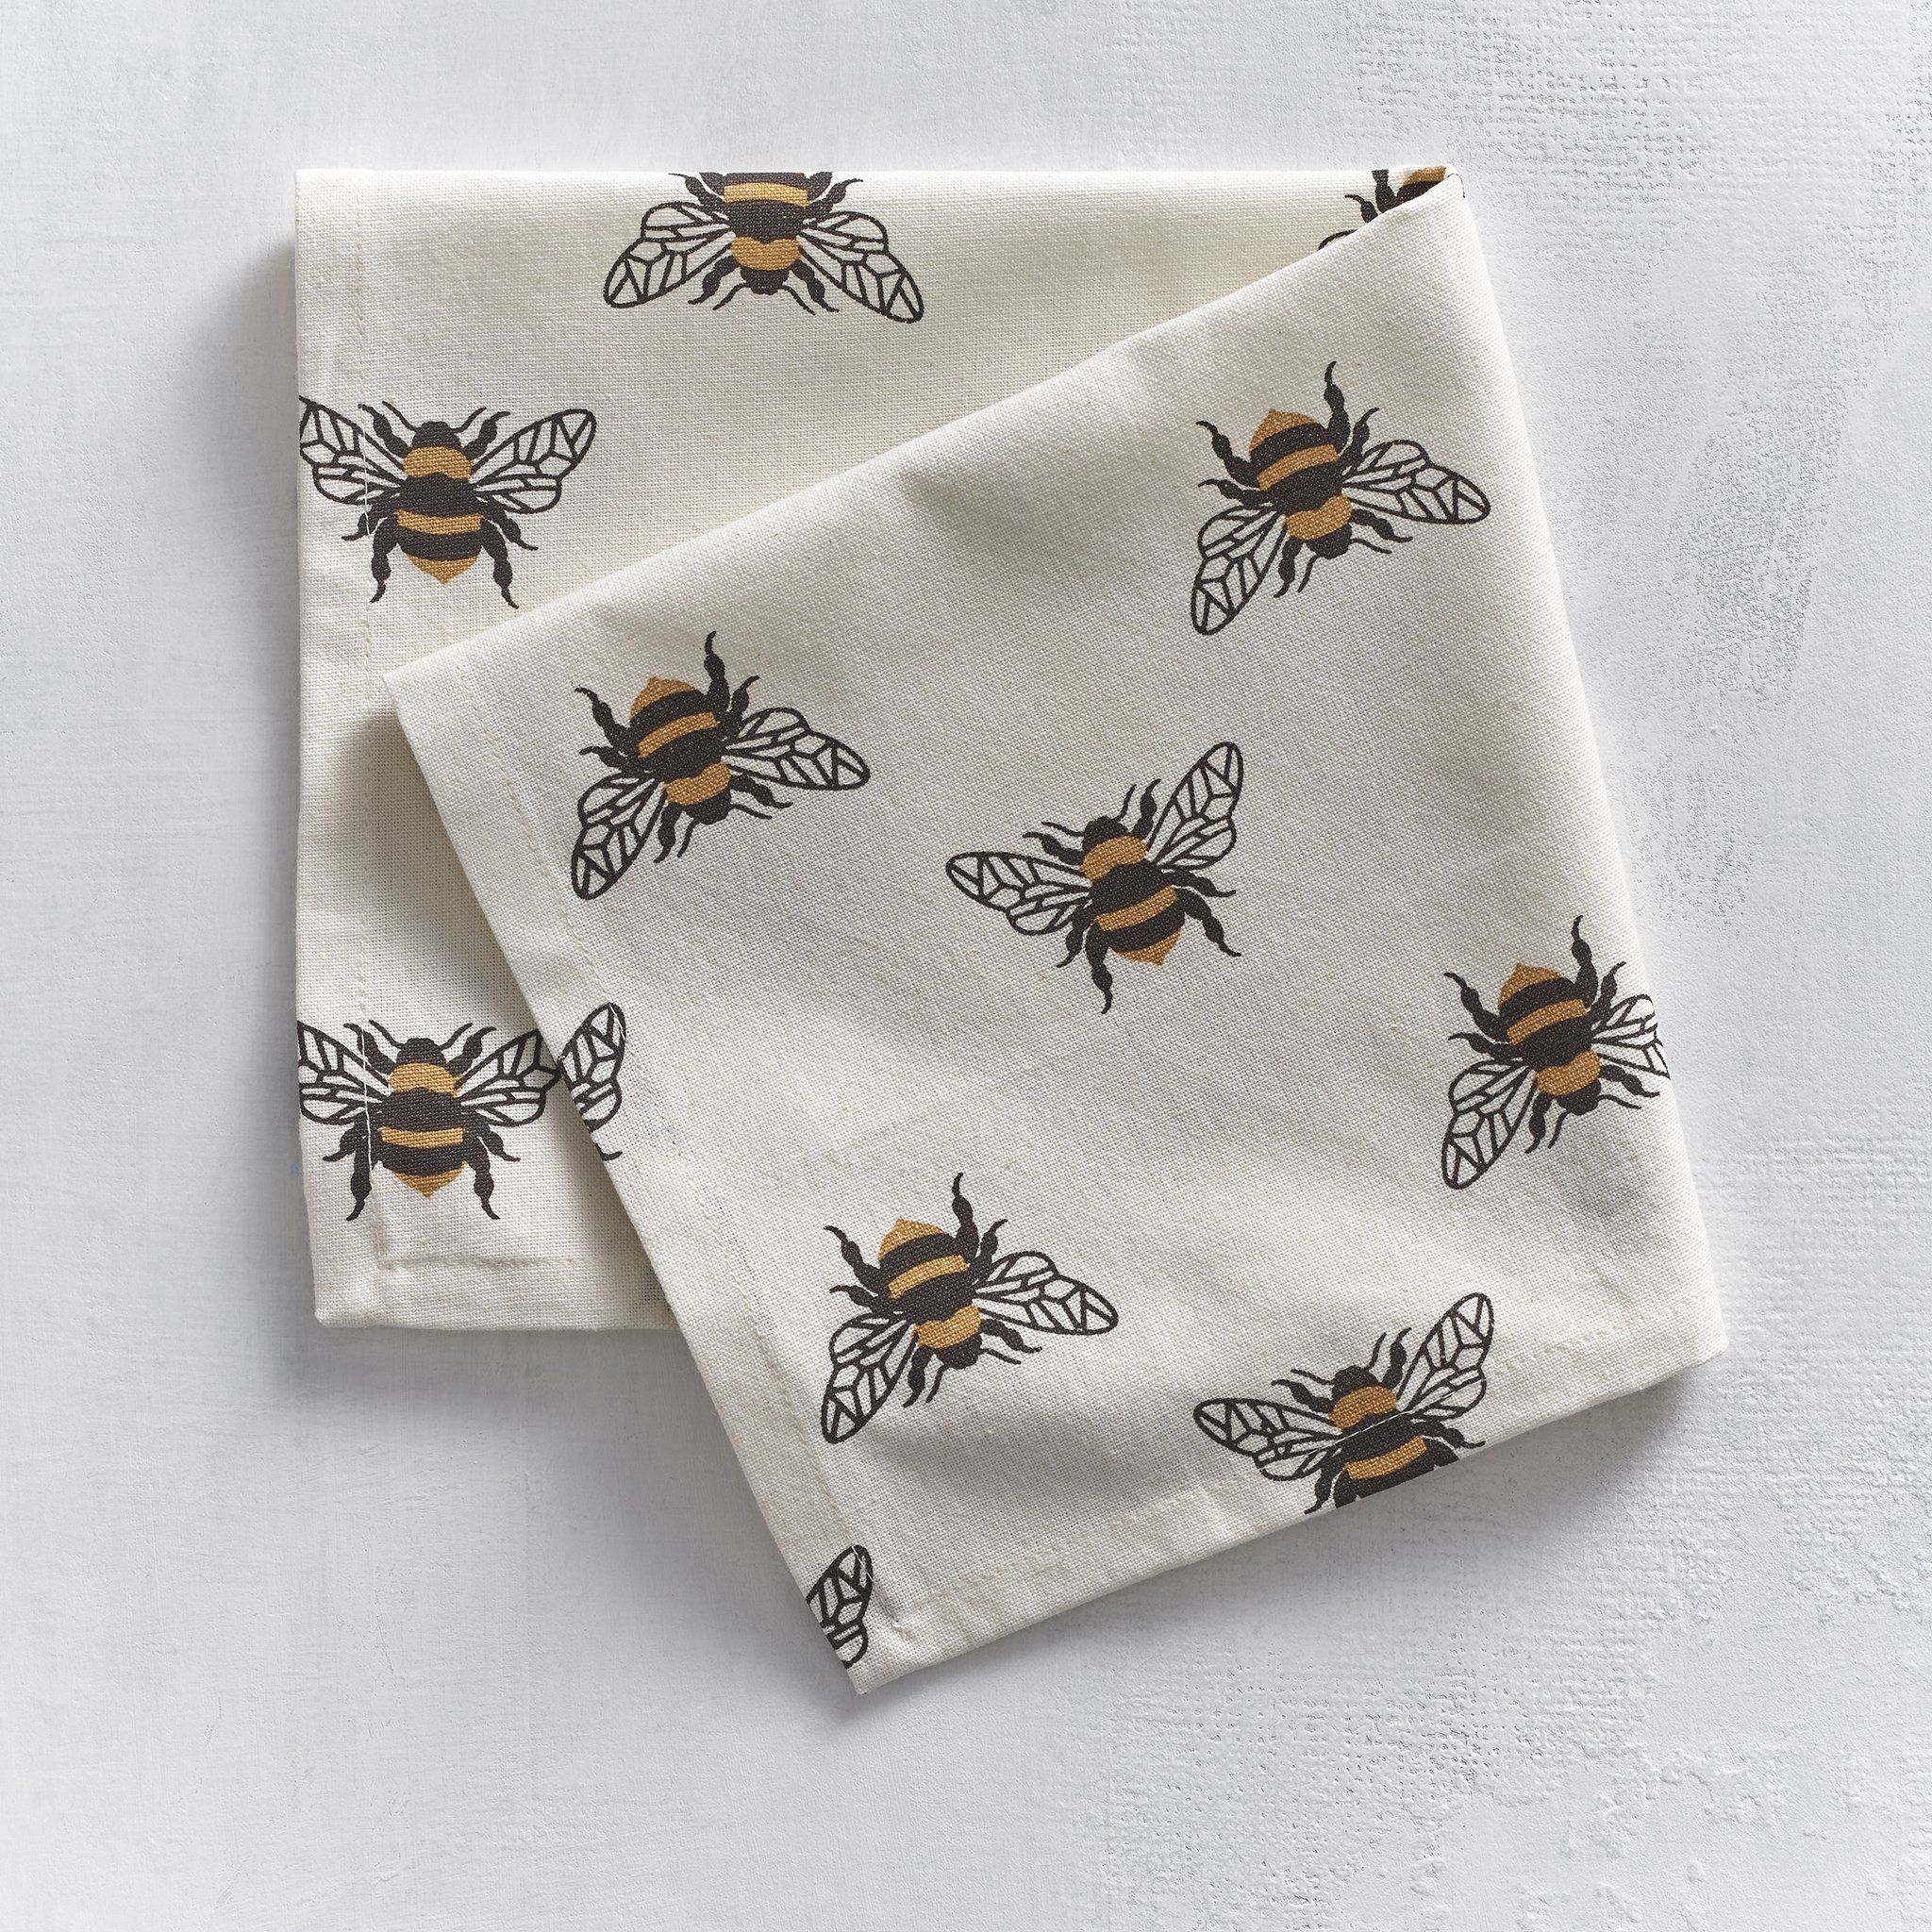 Buzzy Bee Cloth Napkins